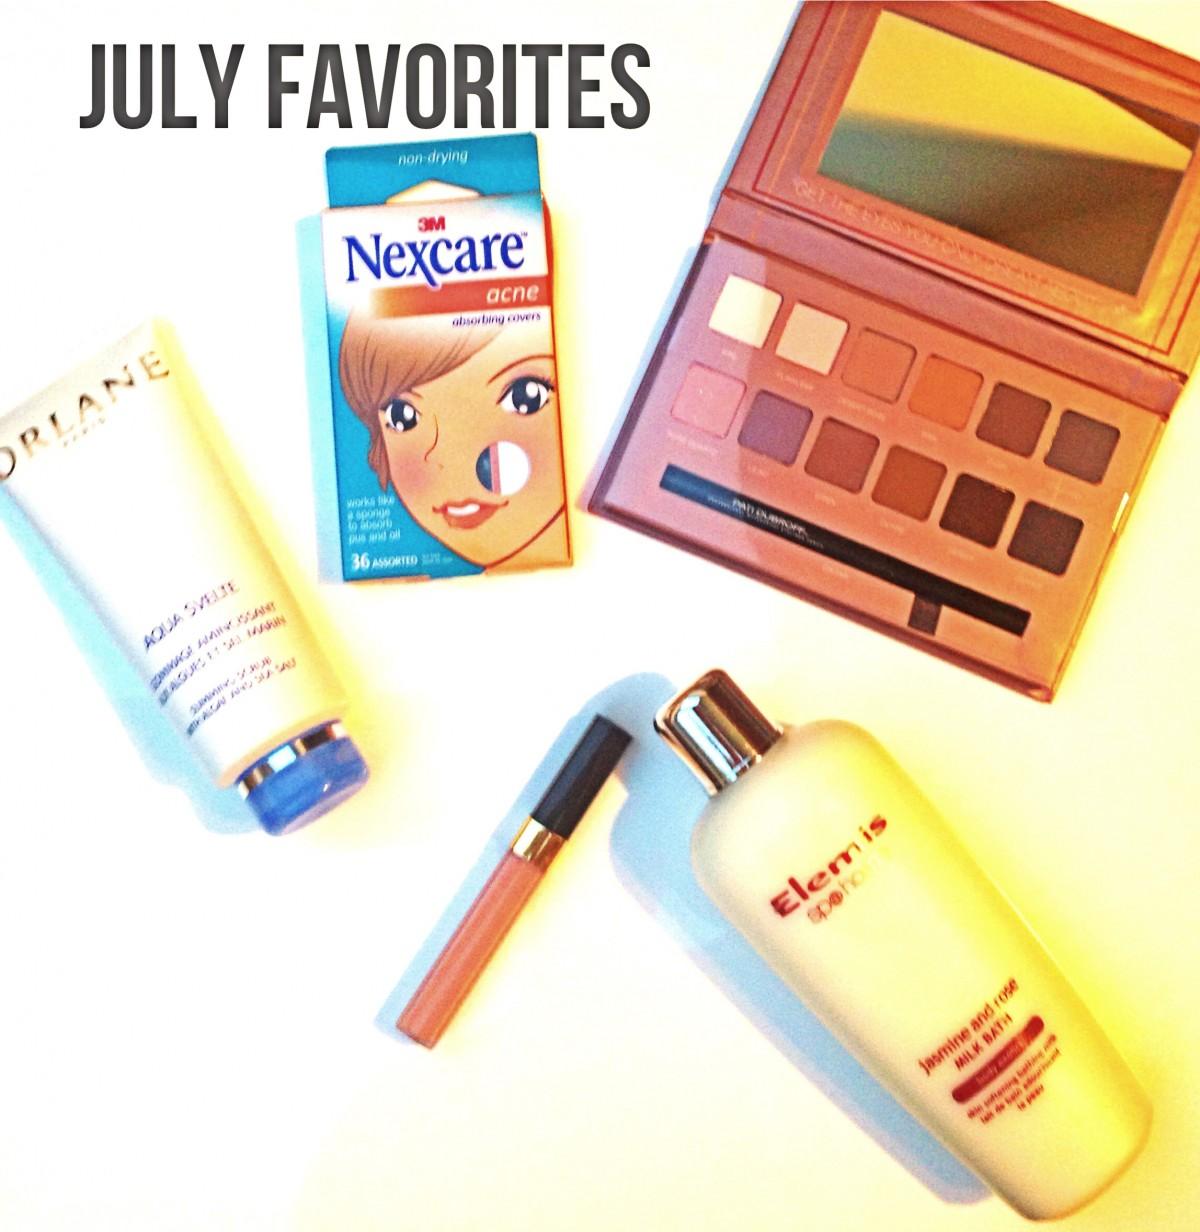 Video: July Favorites